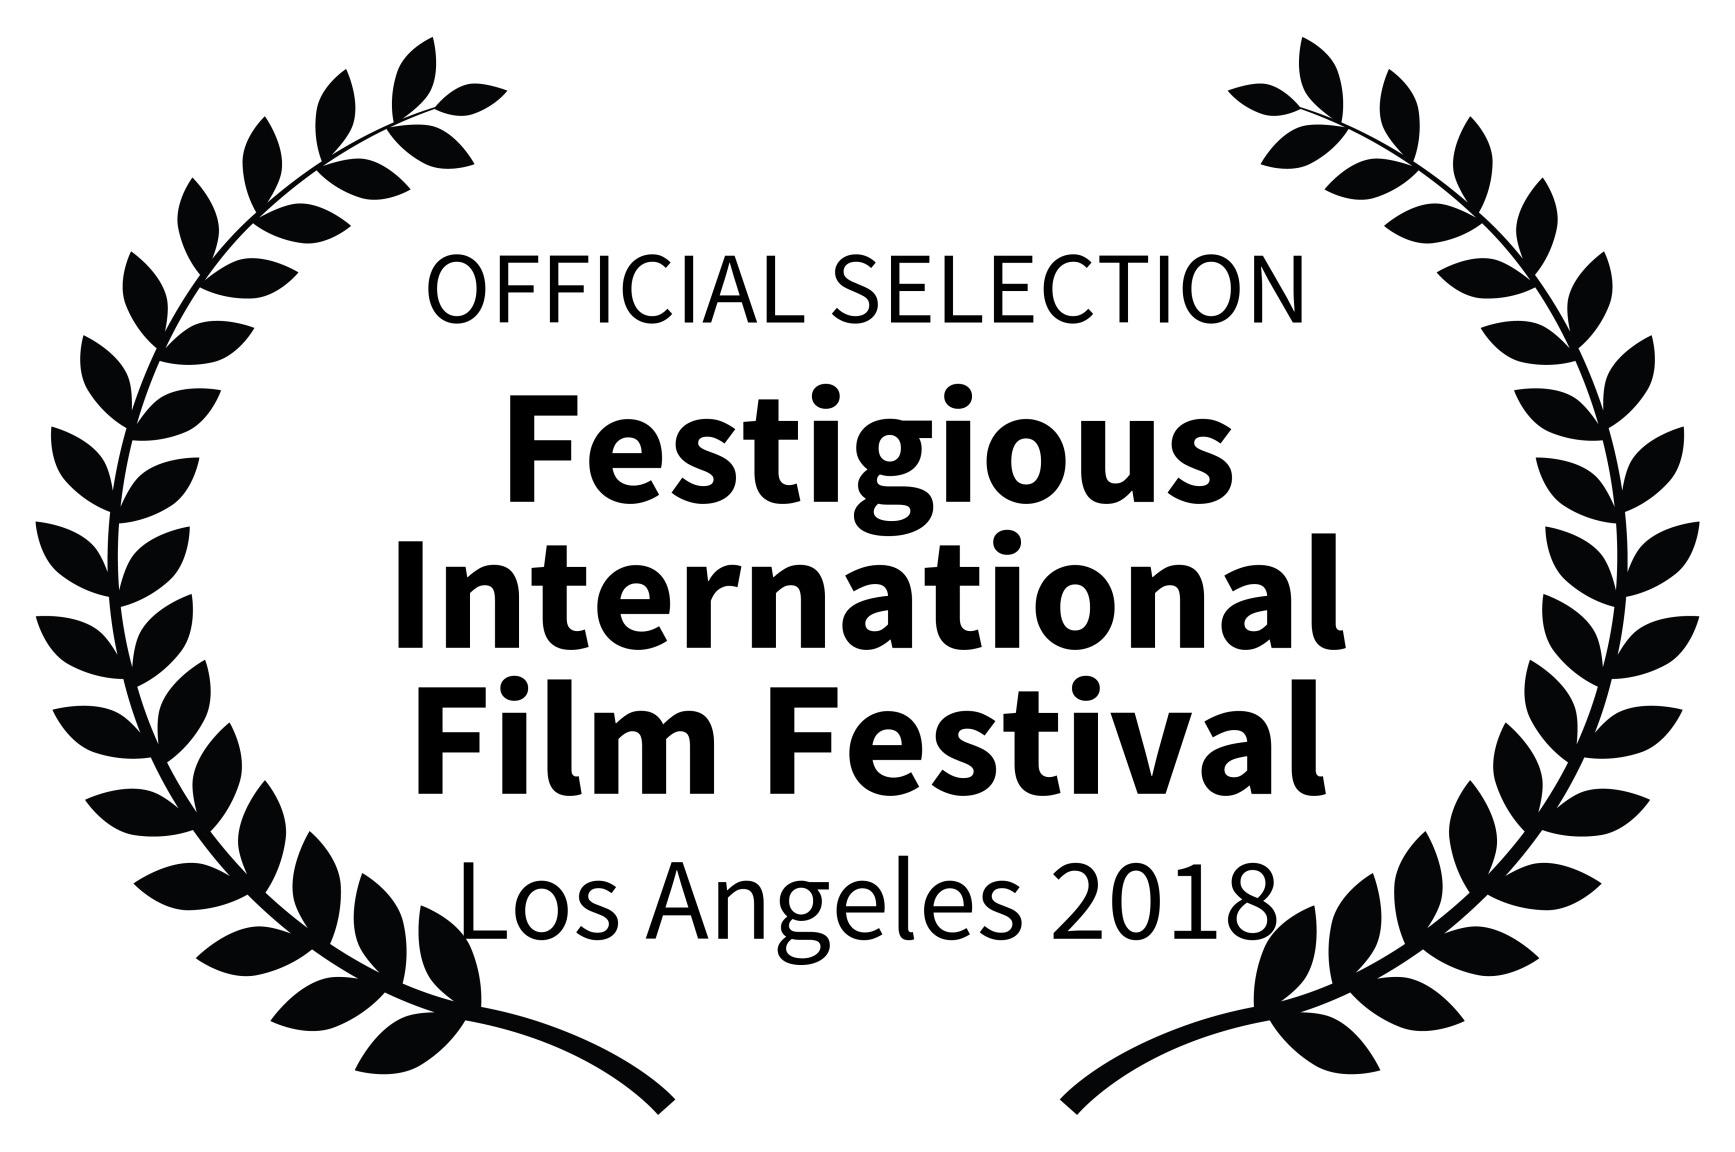 OFFICIAL SELECTION - Festigious International Film Festival - Los Angeles 2018.jpg